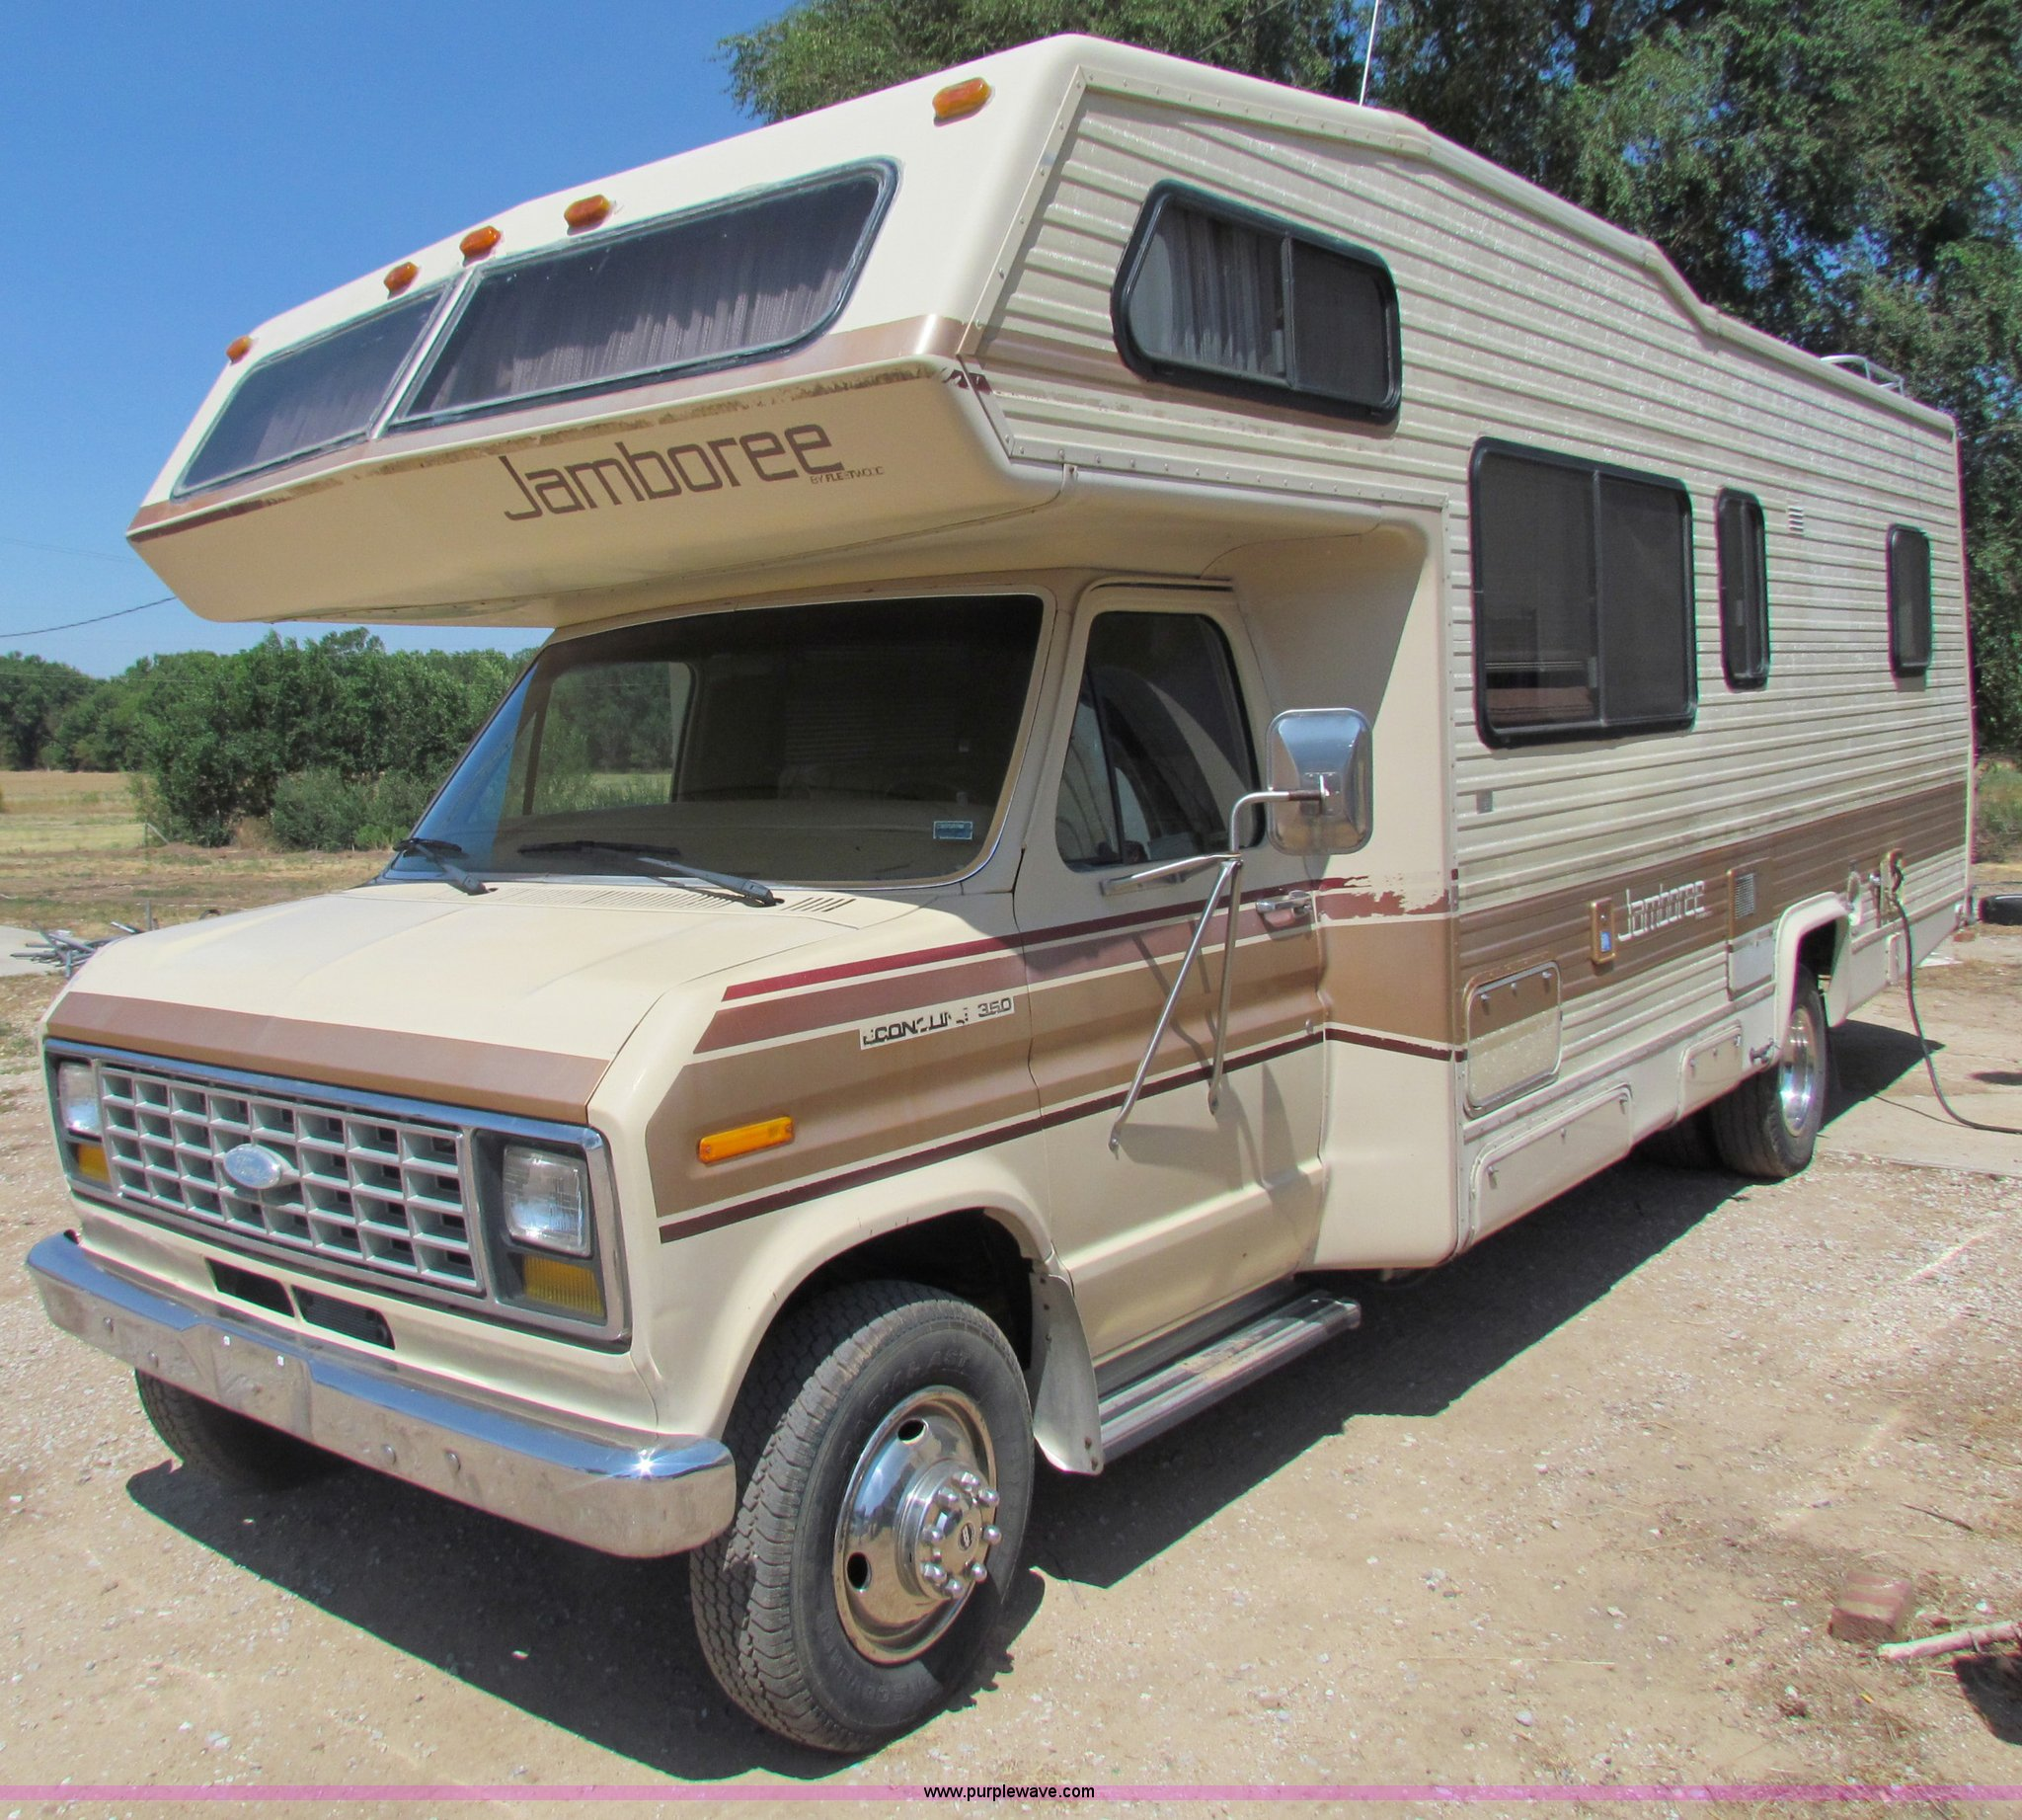 1985 Ford E350 Jamboree RV camper | Item B7396 | SOLD! Wedne